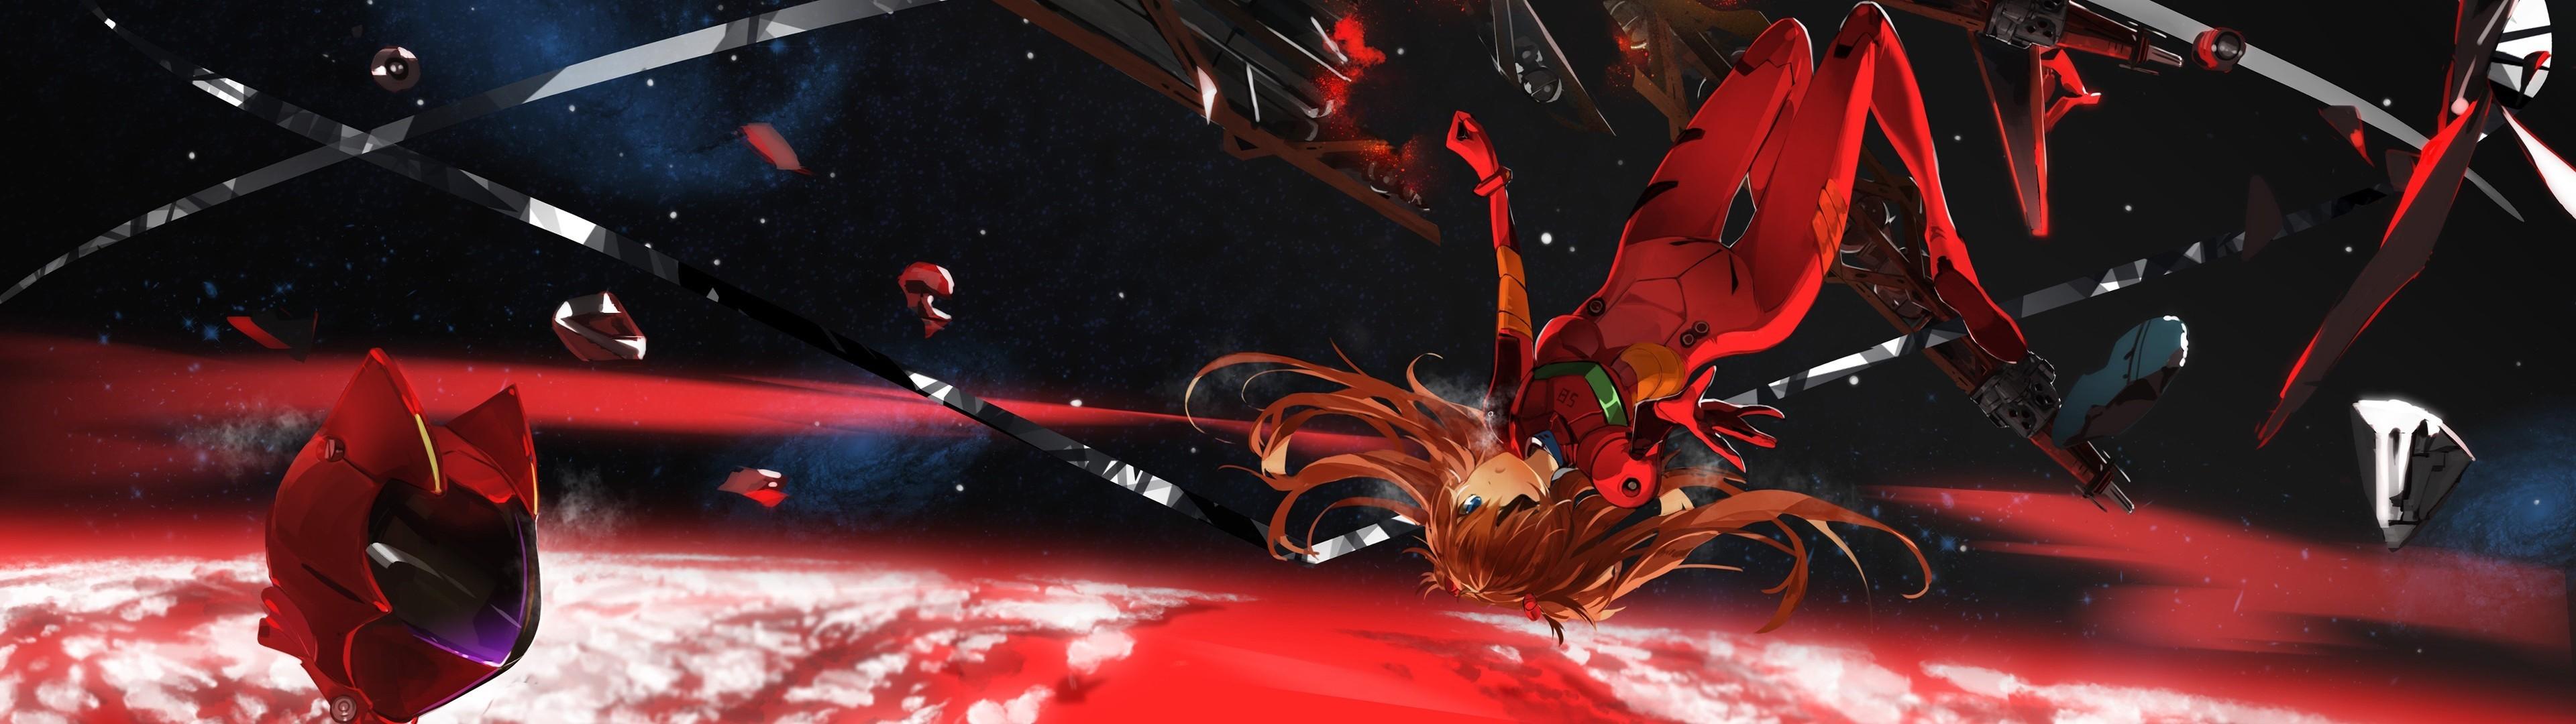 anime · dual screen · Asuka Langley Soryu · EVA Unit 02 · Neon Genesis  Evangelion